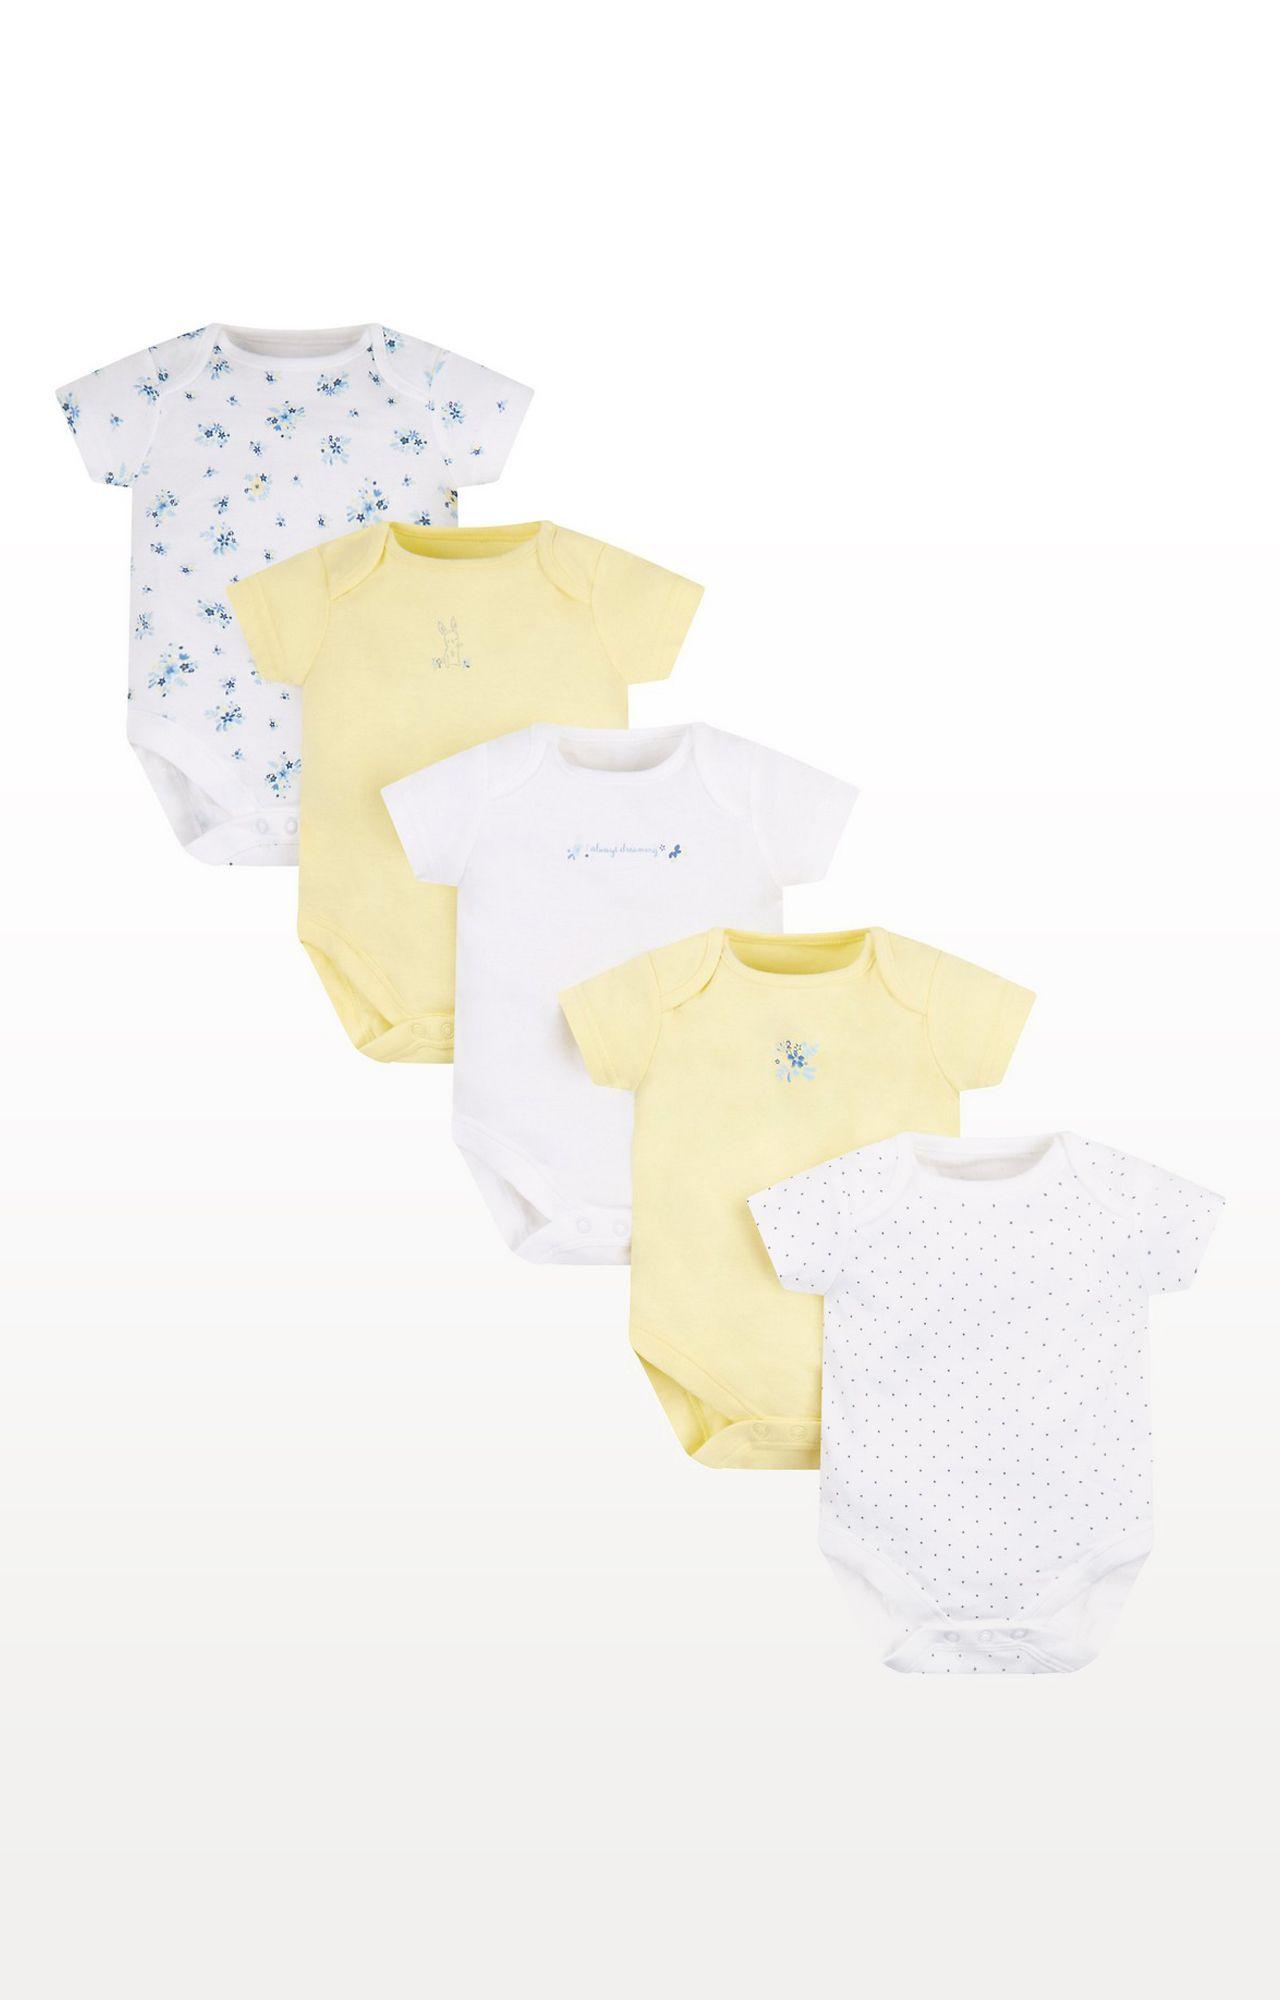 Mothercare | Lemon Bunny Bodysuits - Pack of 5